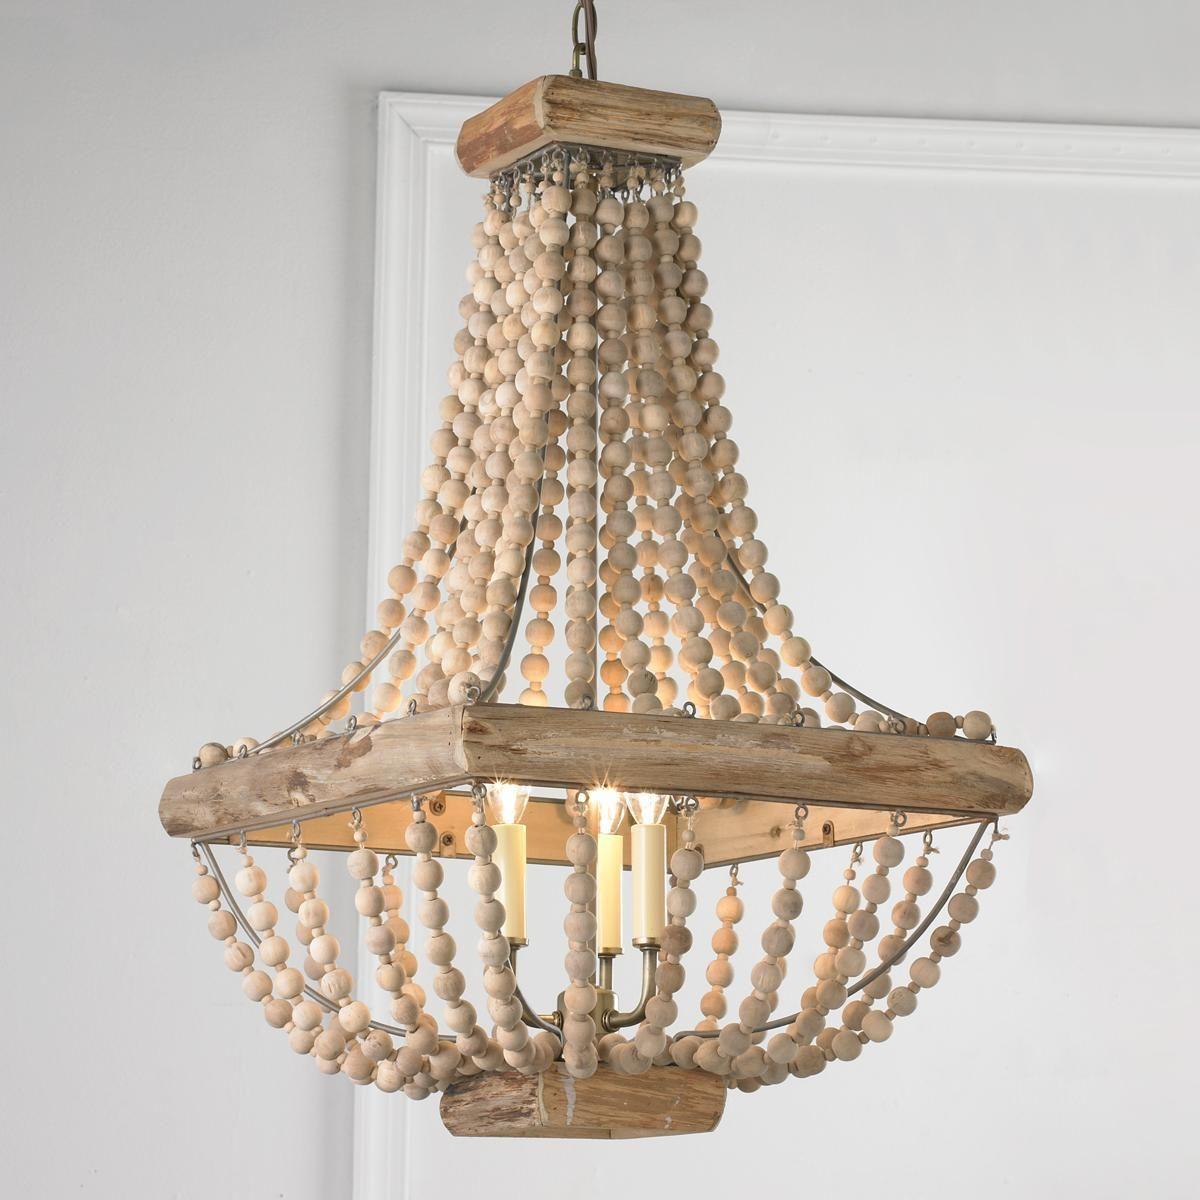 Wood Bead Chandelier - Shades of Light   Lighting   Pinterest ...